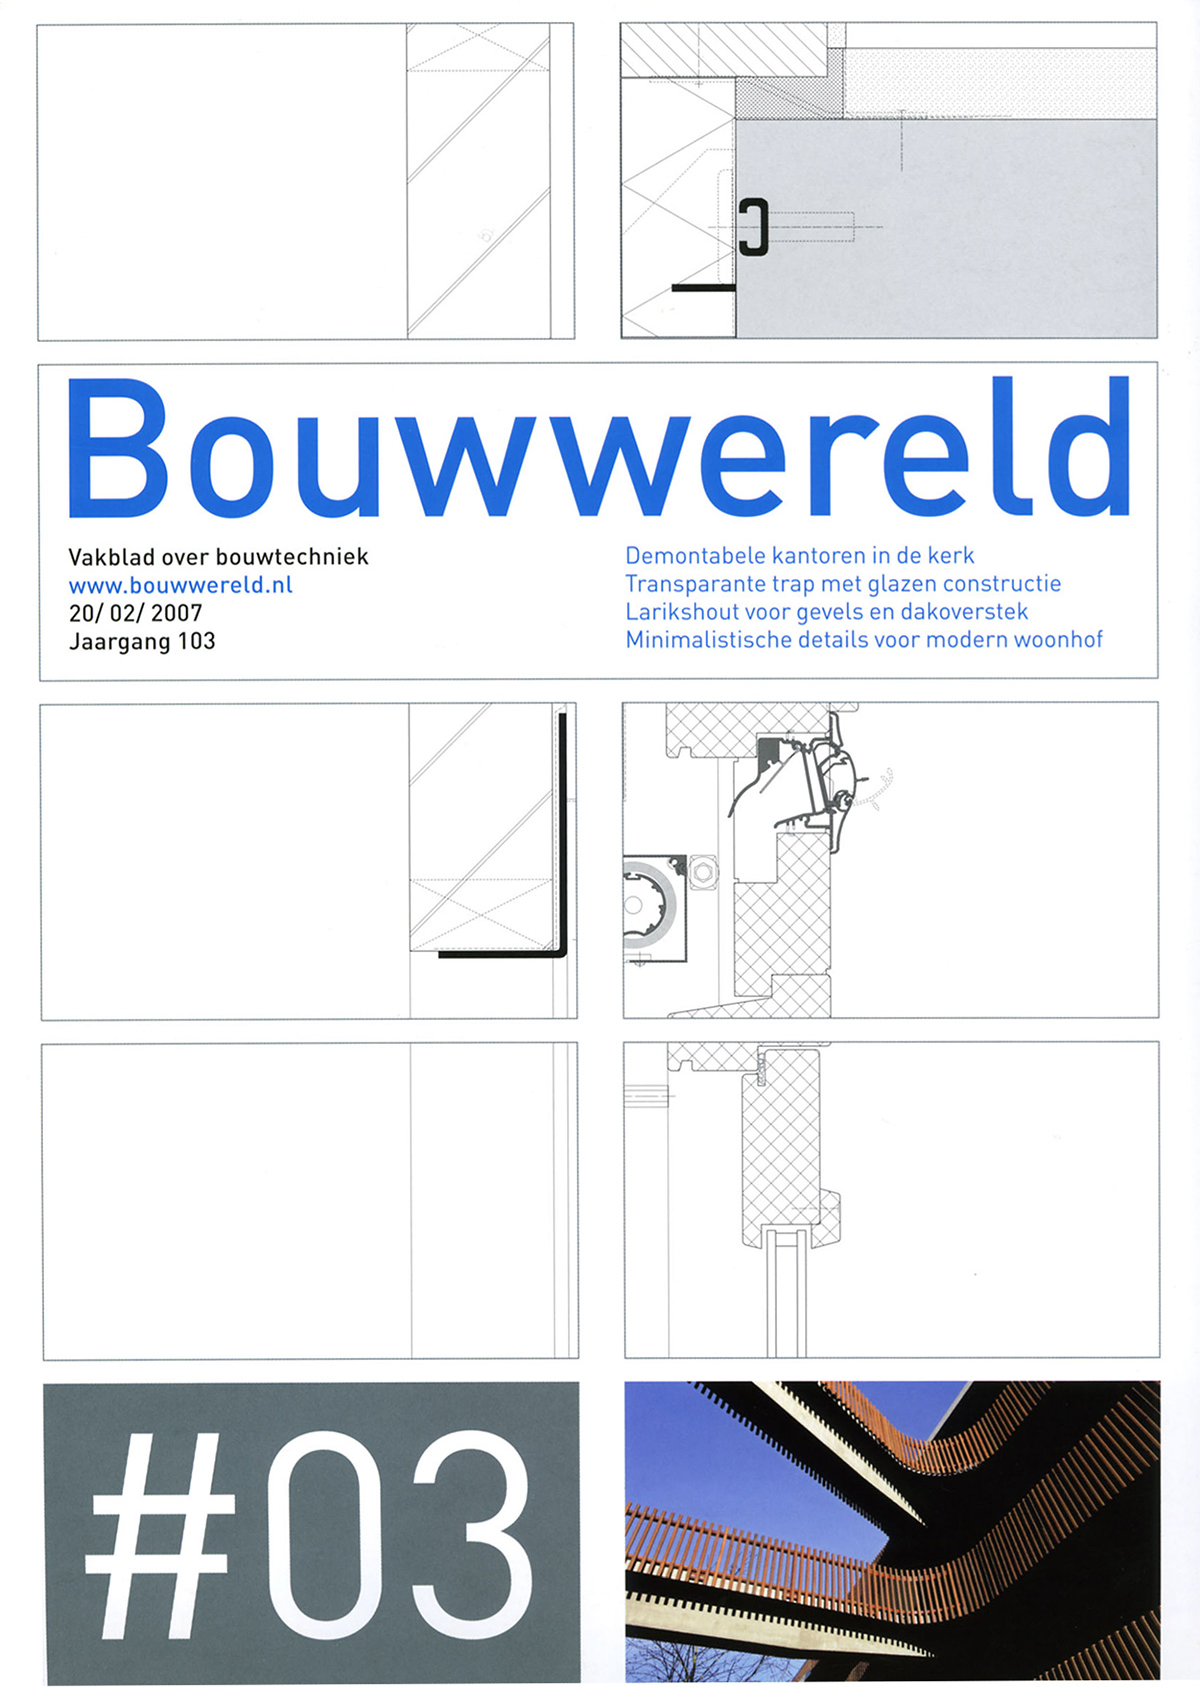 Bouwwereld     Heerema   2007